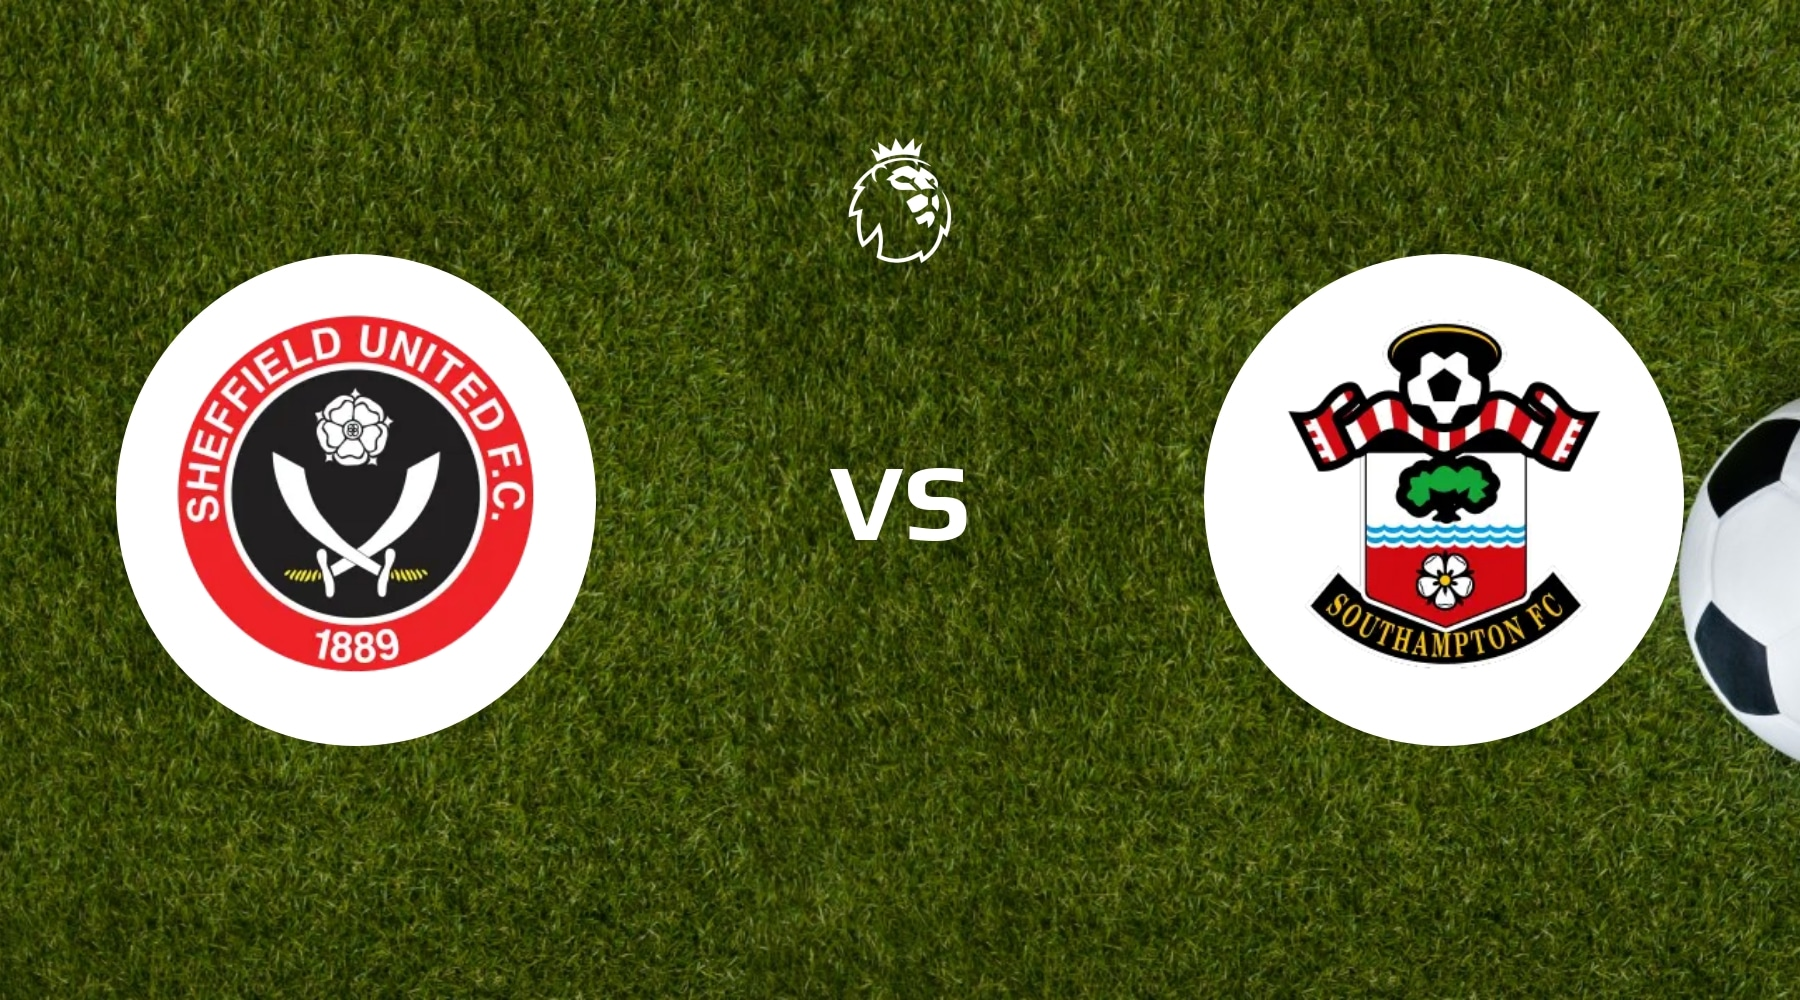 Sheffield United vs Southampton